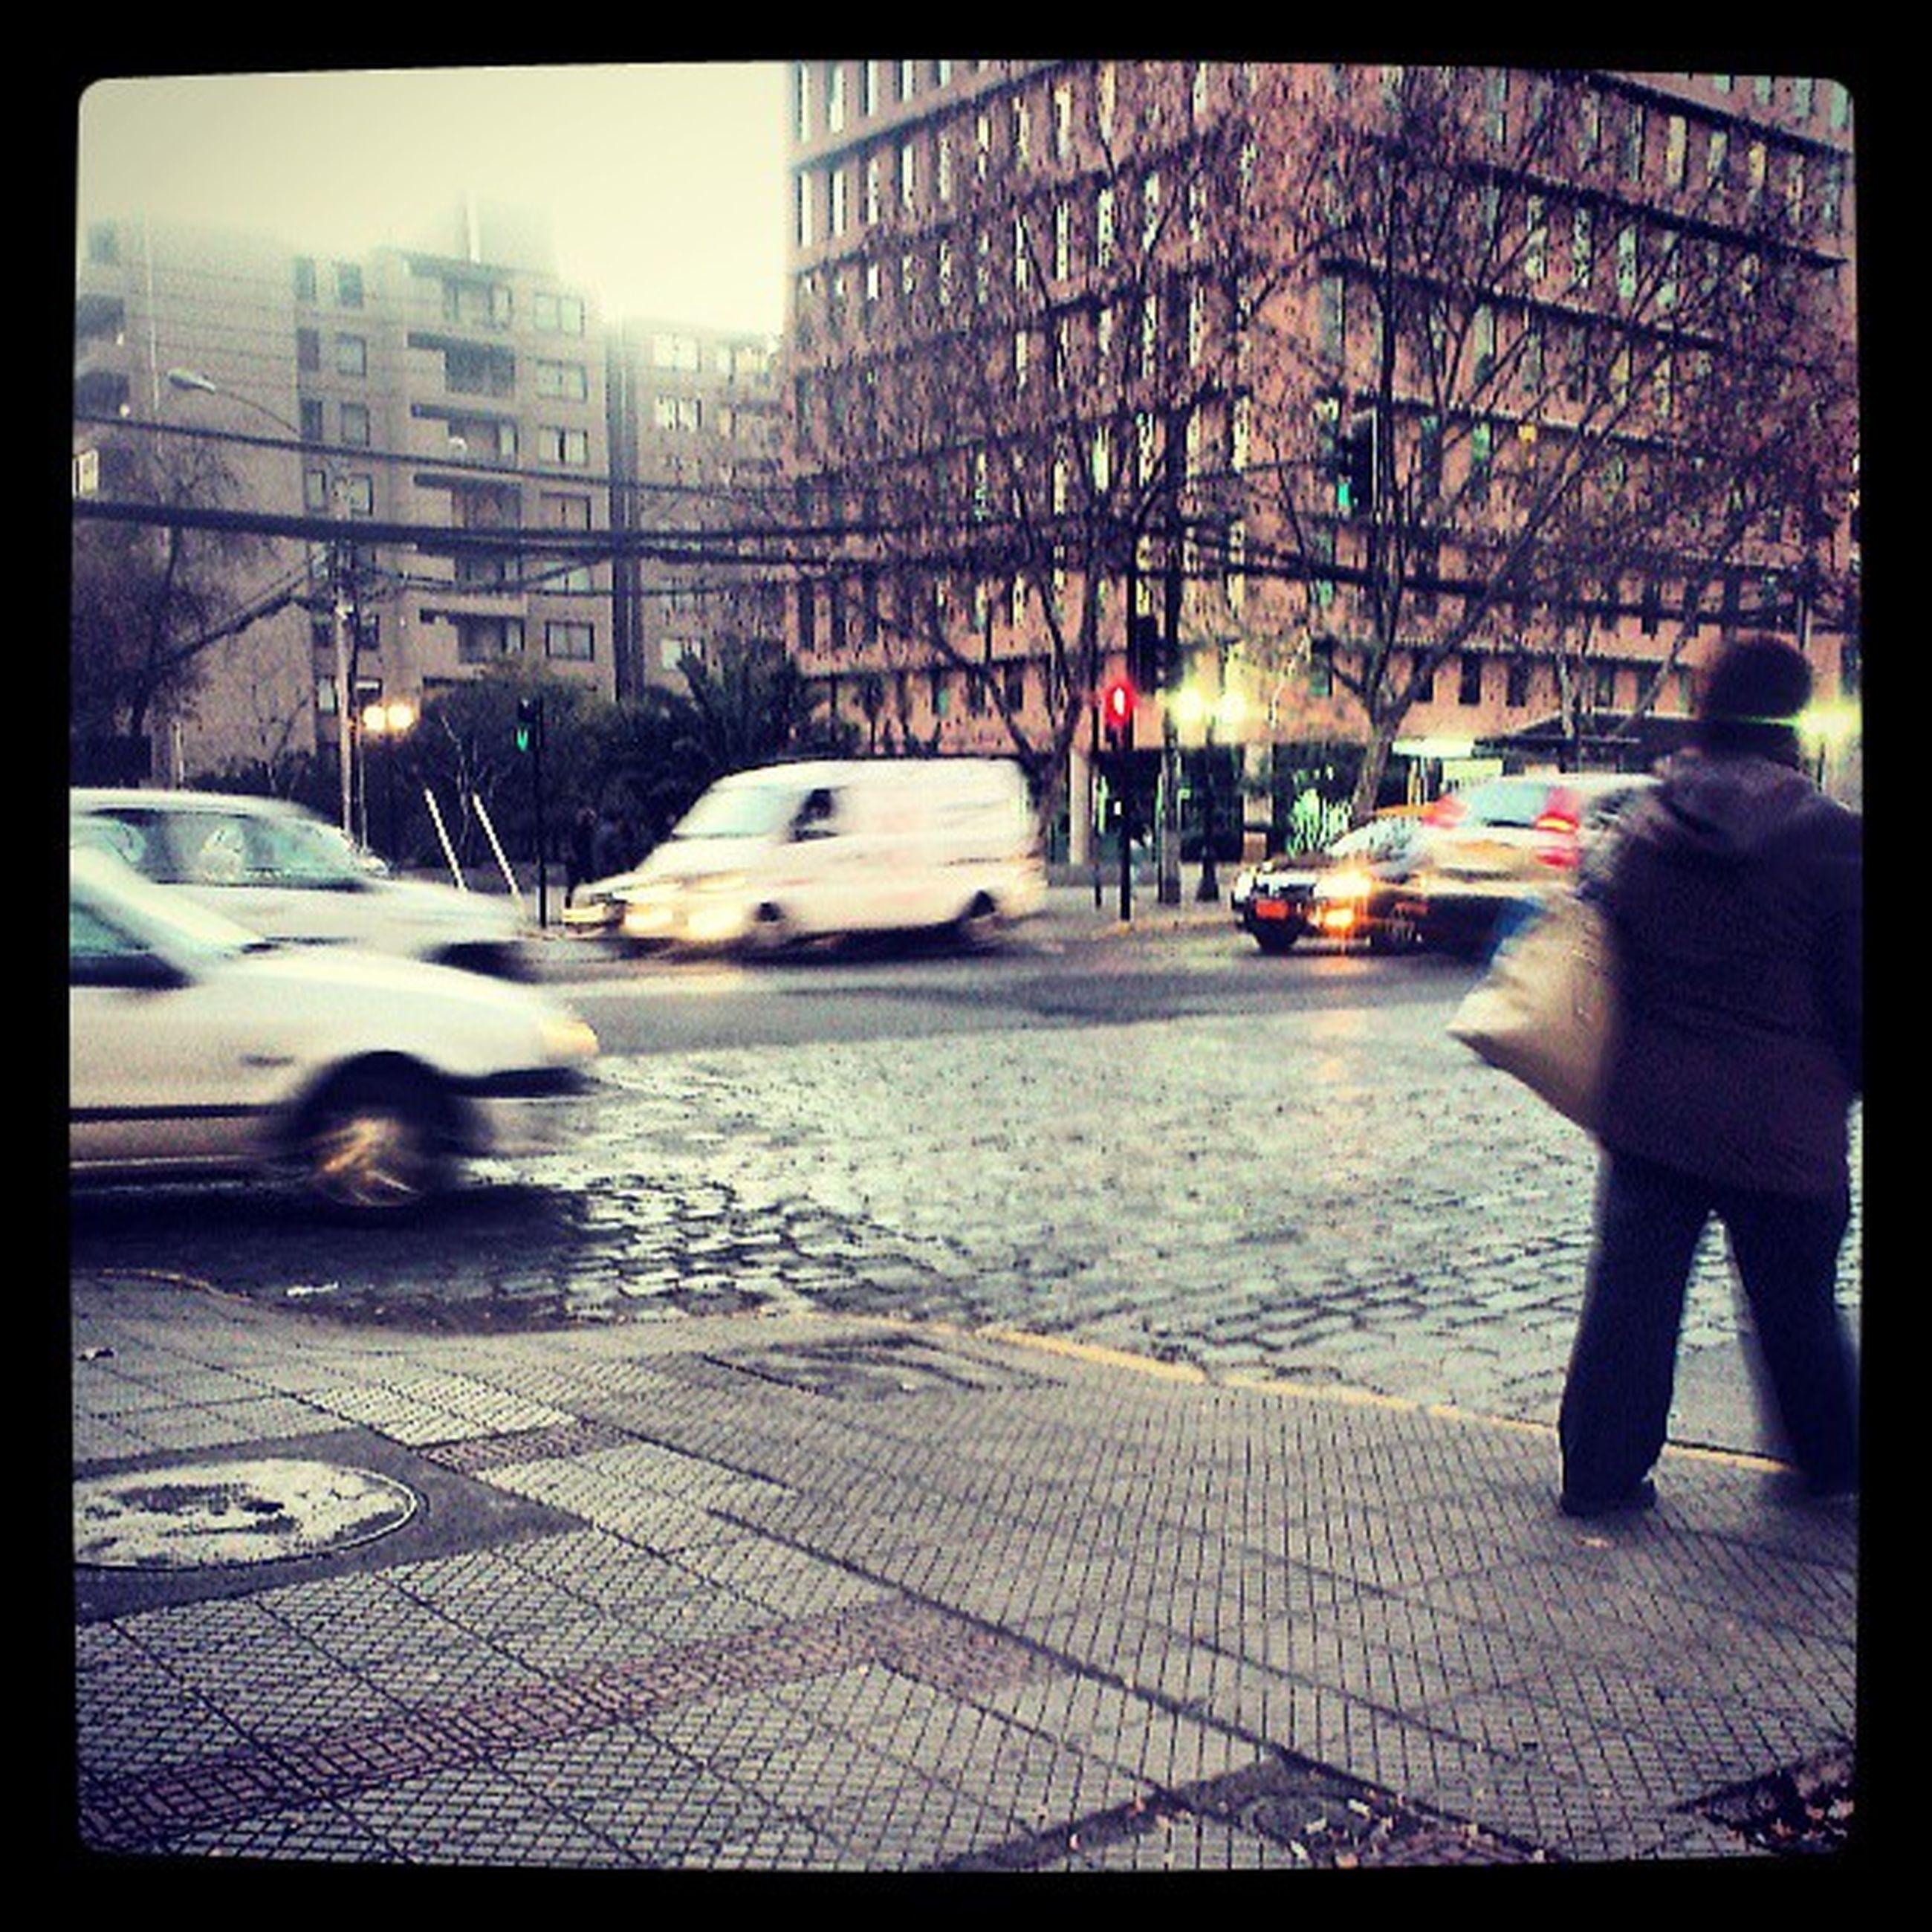 building exterior, transfer print, architecture, built structure, city, auto post production filter, street, lifestyles, city life, men, leisure activity, car, walking, person, unrecognizable person, season, winter, transportation